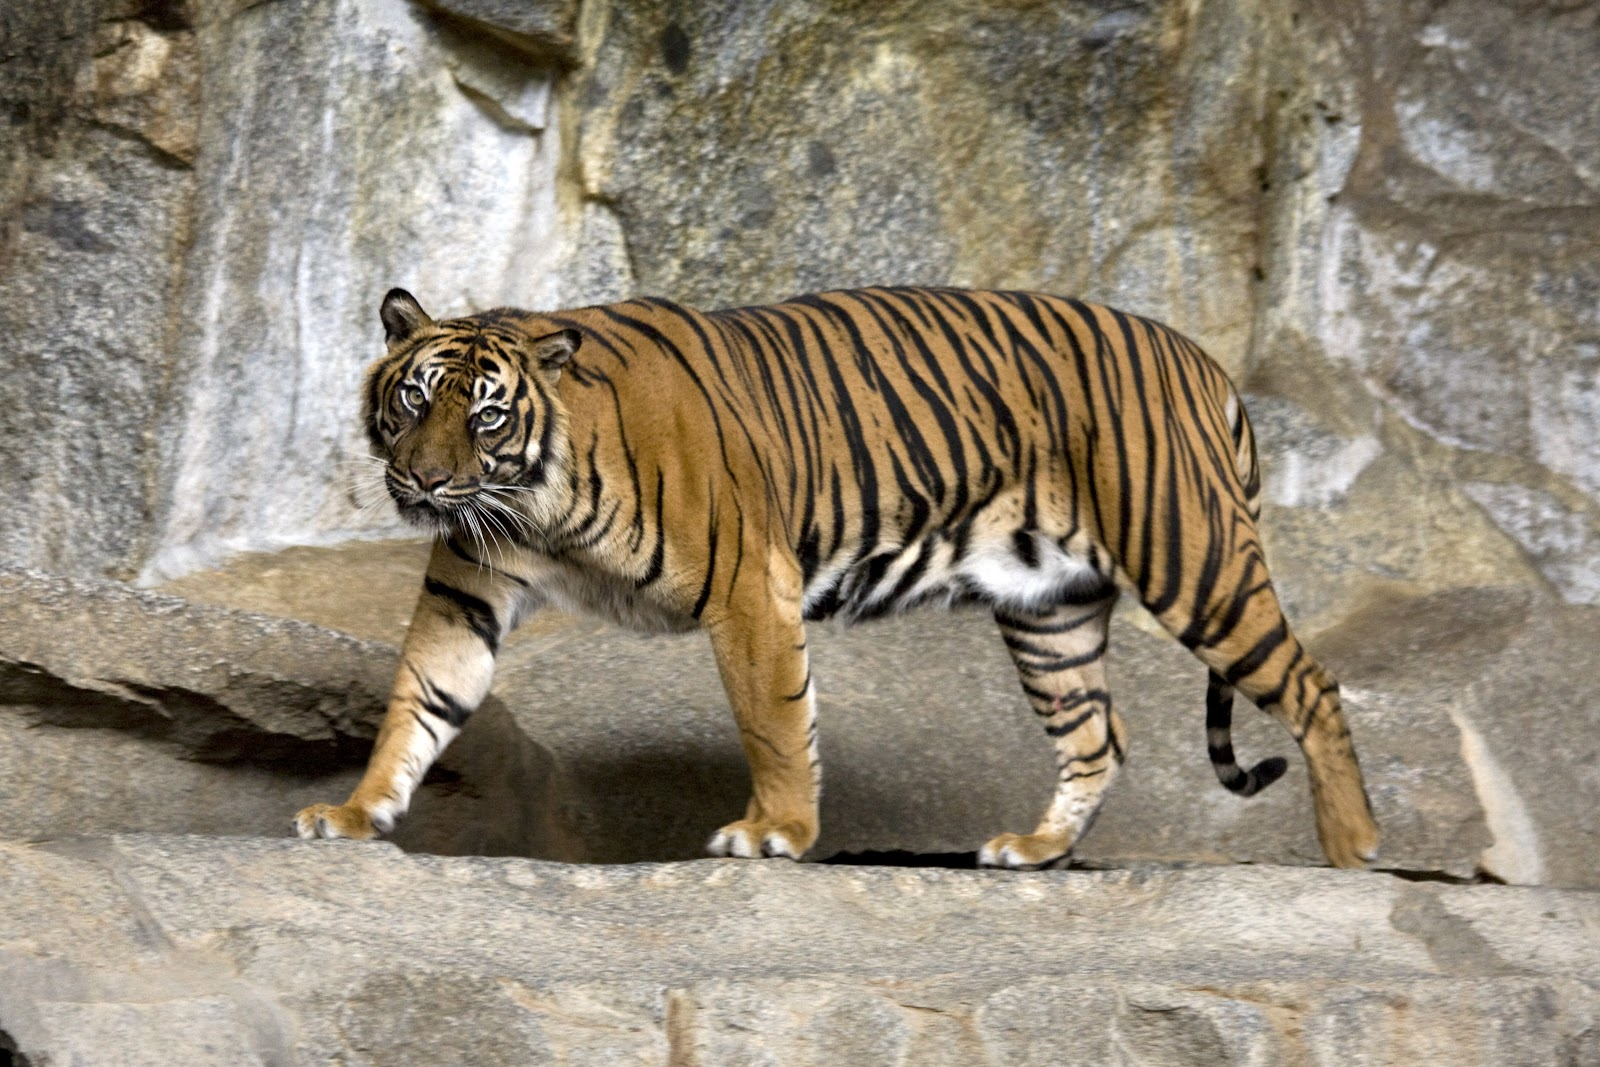 File:Sumatran Tiger Berlin Tierpark.jpg - Wikimedia Commons